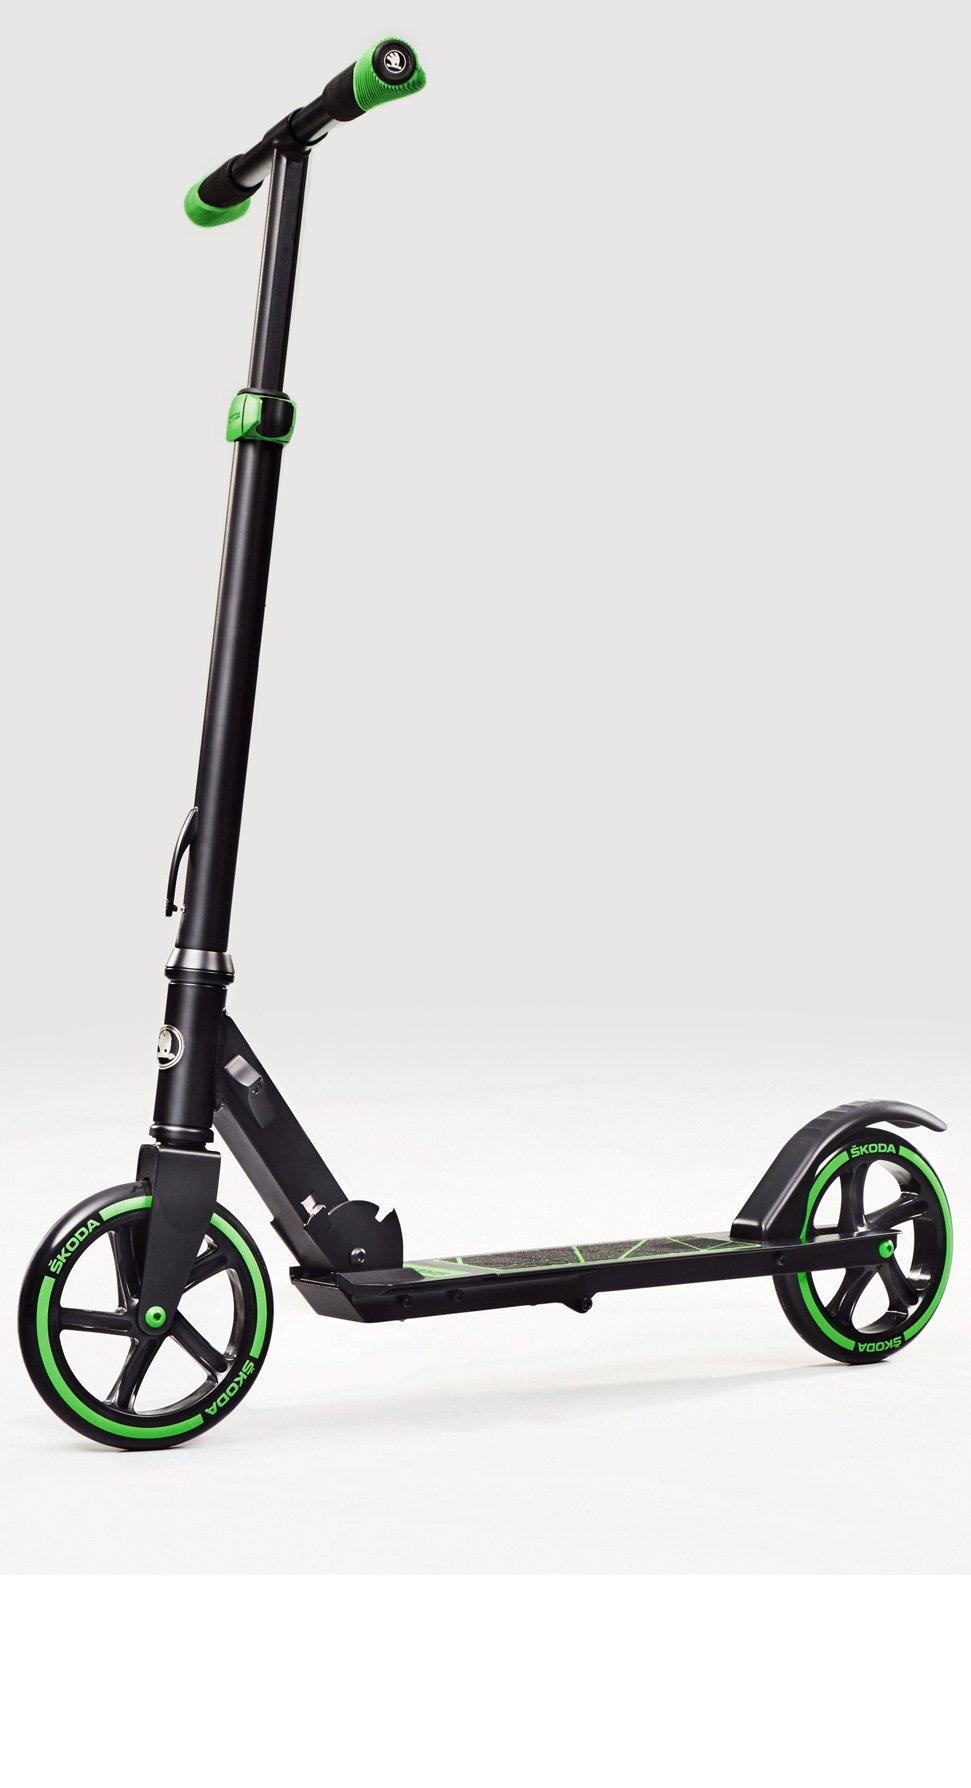 skoda-scooter-01-kopya